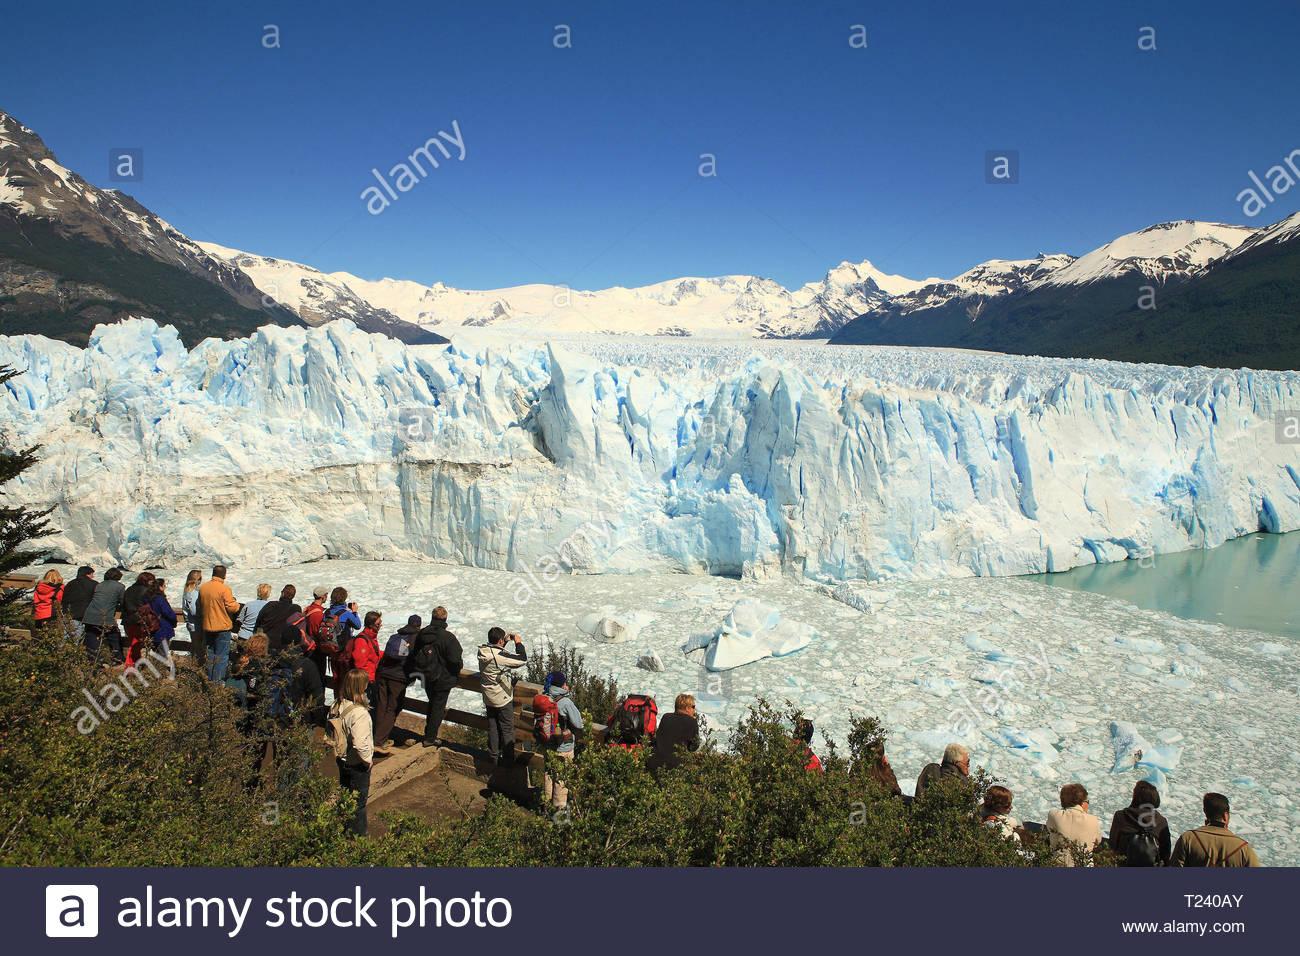 People at a view point on Perito Moreno Glacier, Santa Cruz Province, Patagonia, Argentina Stock Photo